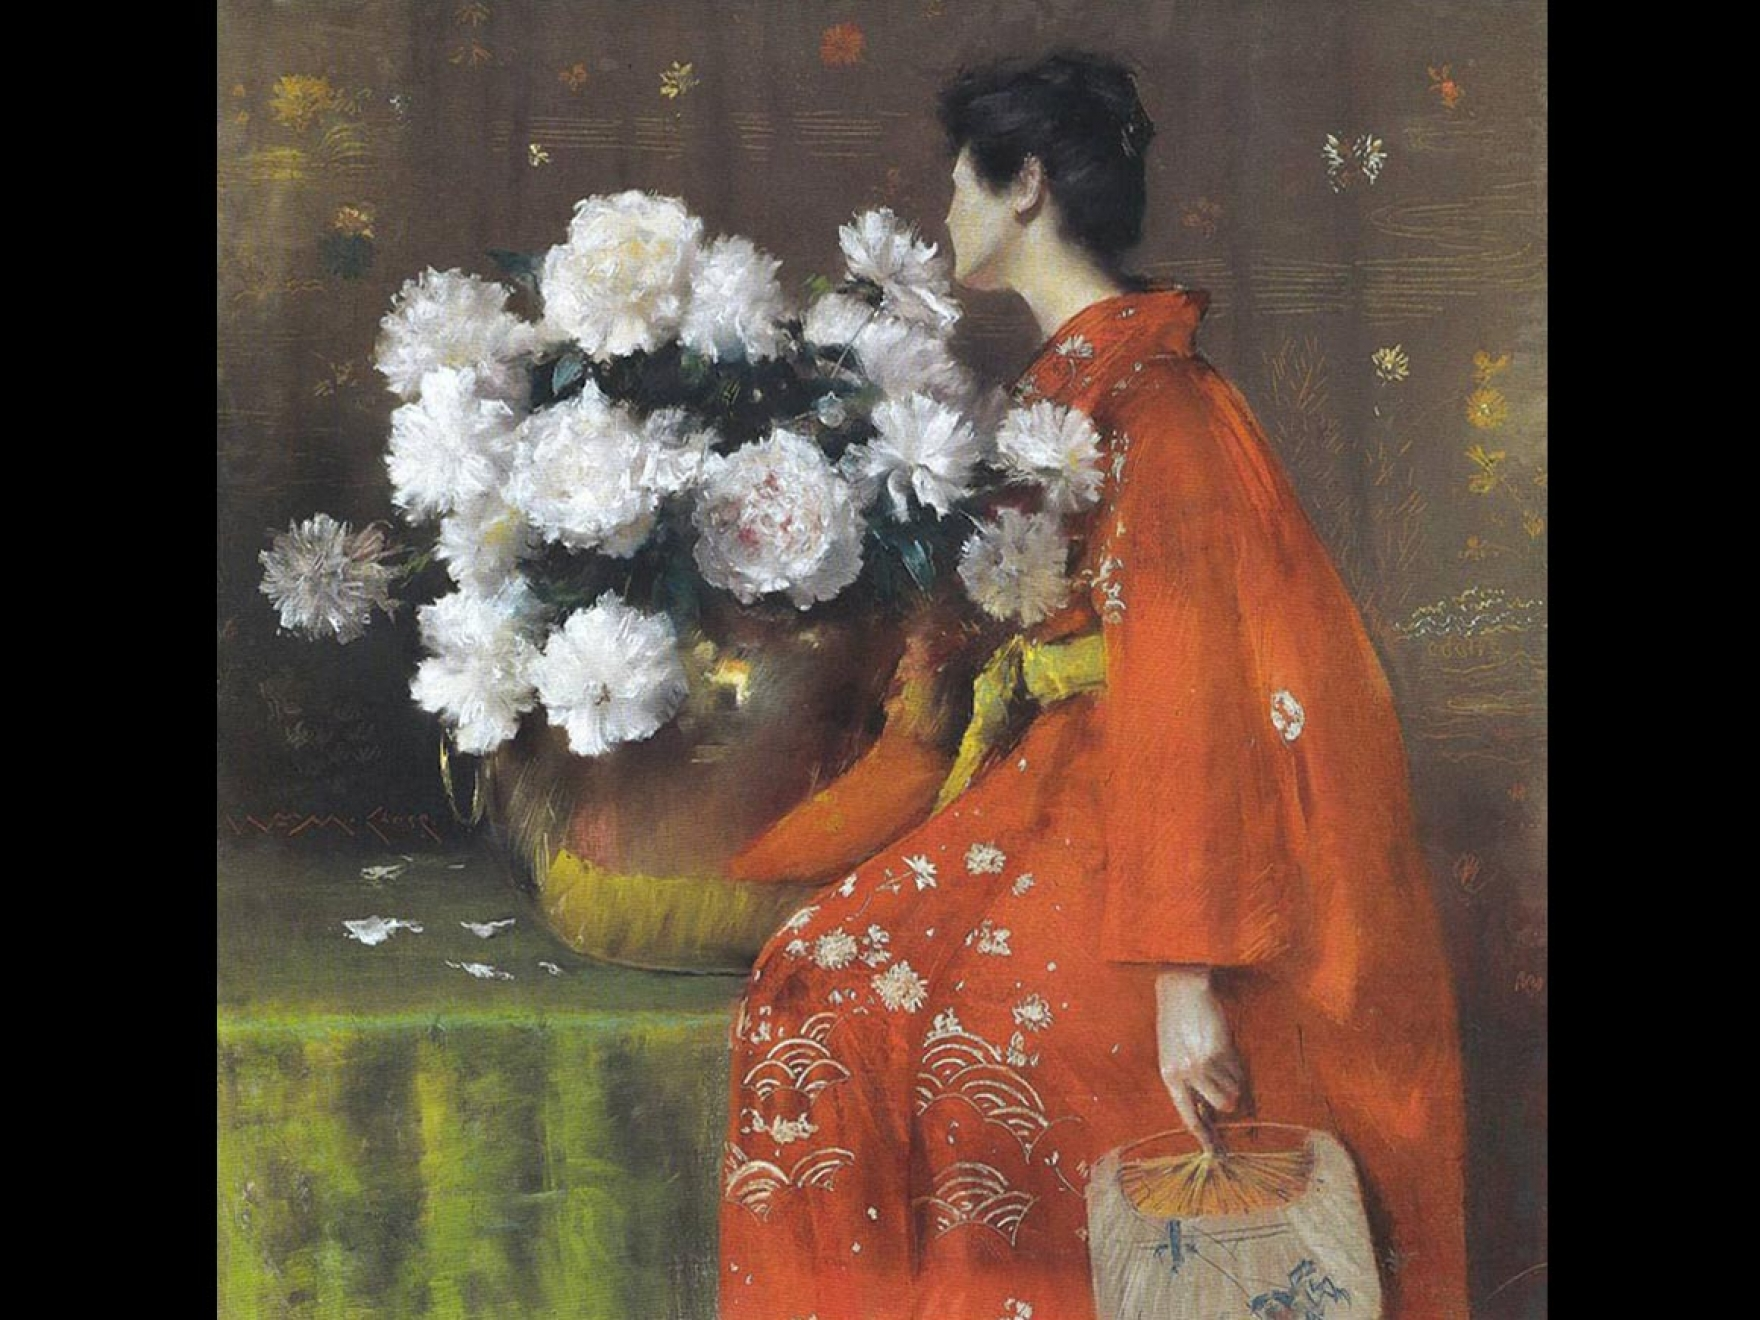 Portrait of woman in kimono facing peonies